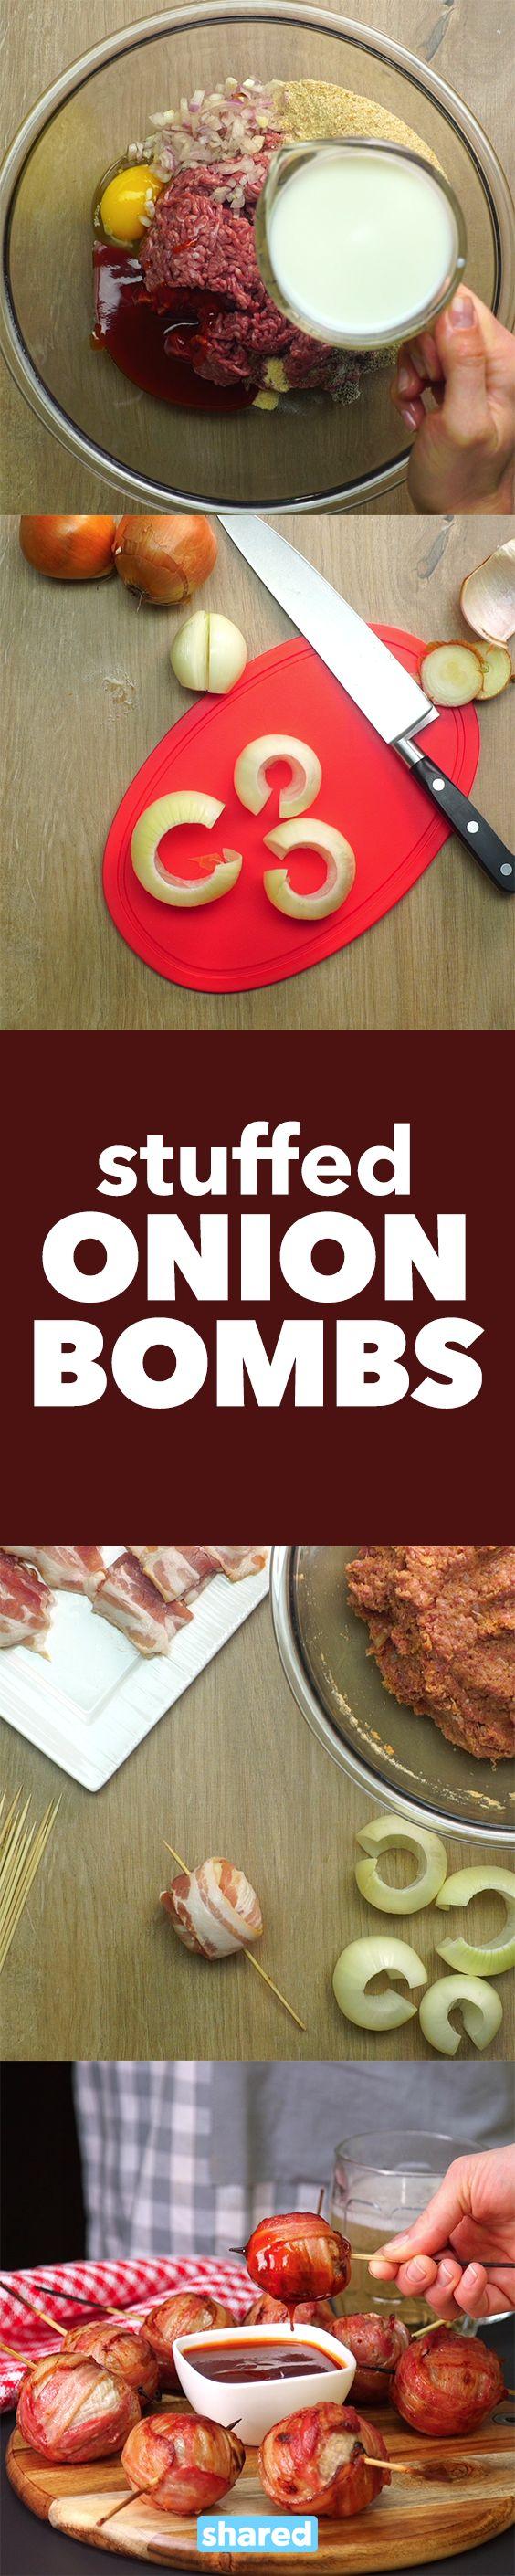 Stuffed Onion Bombs